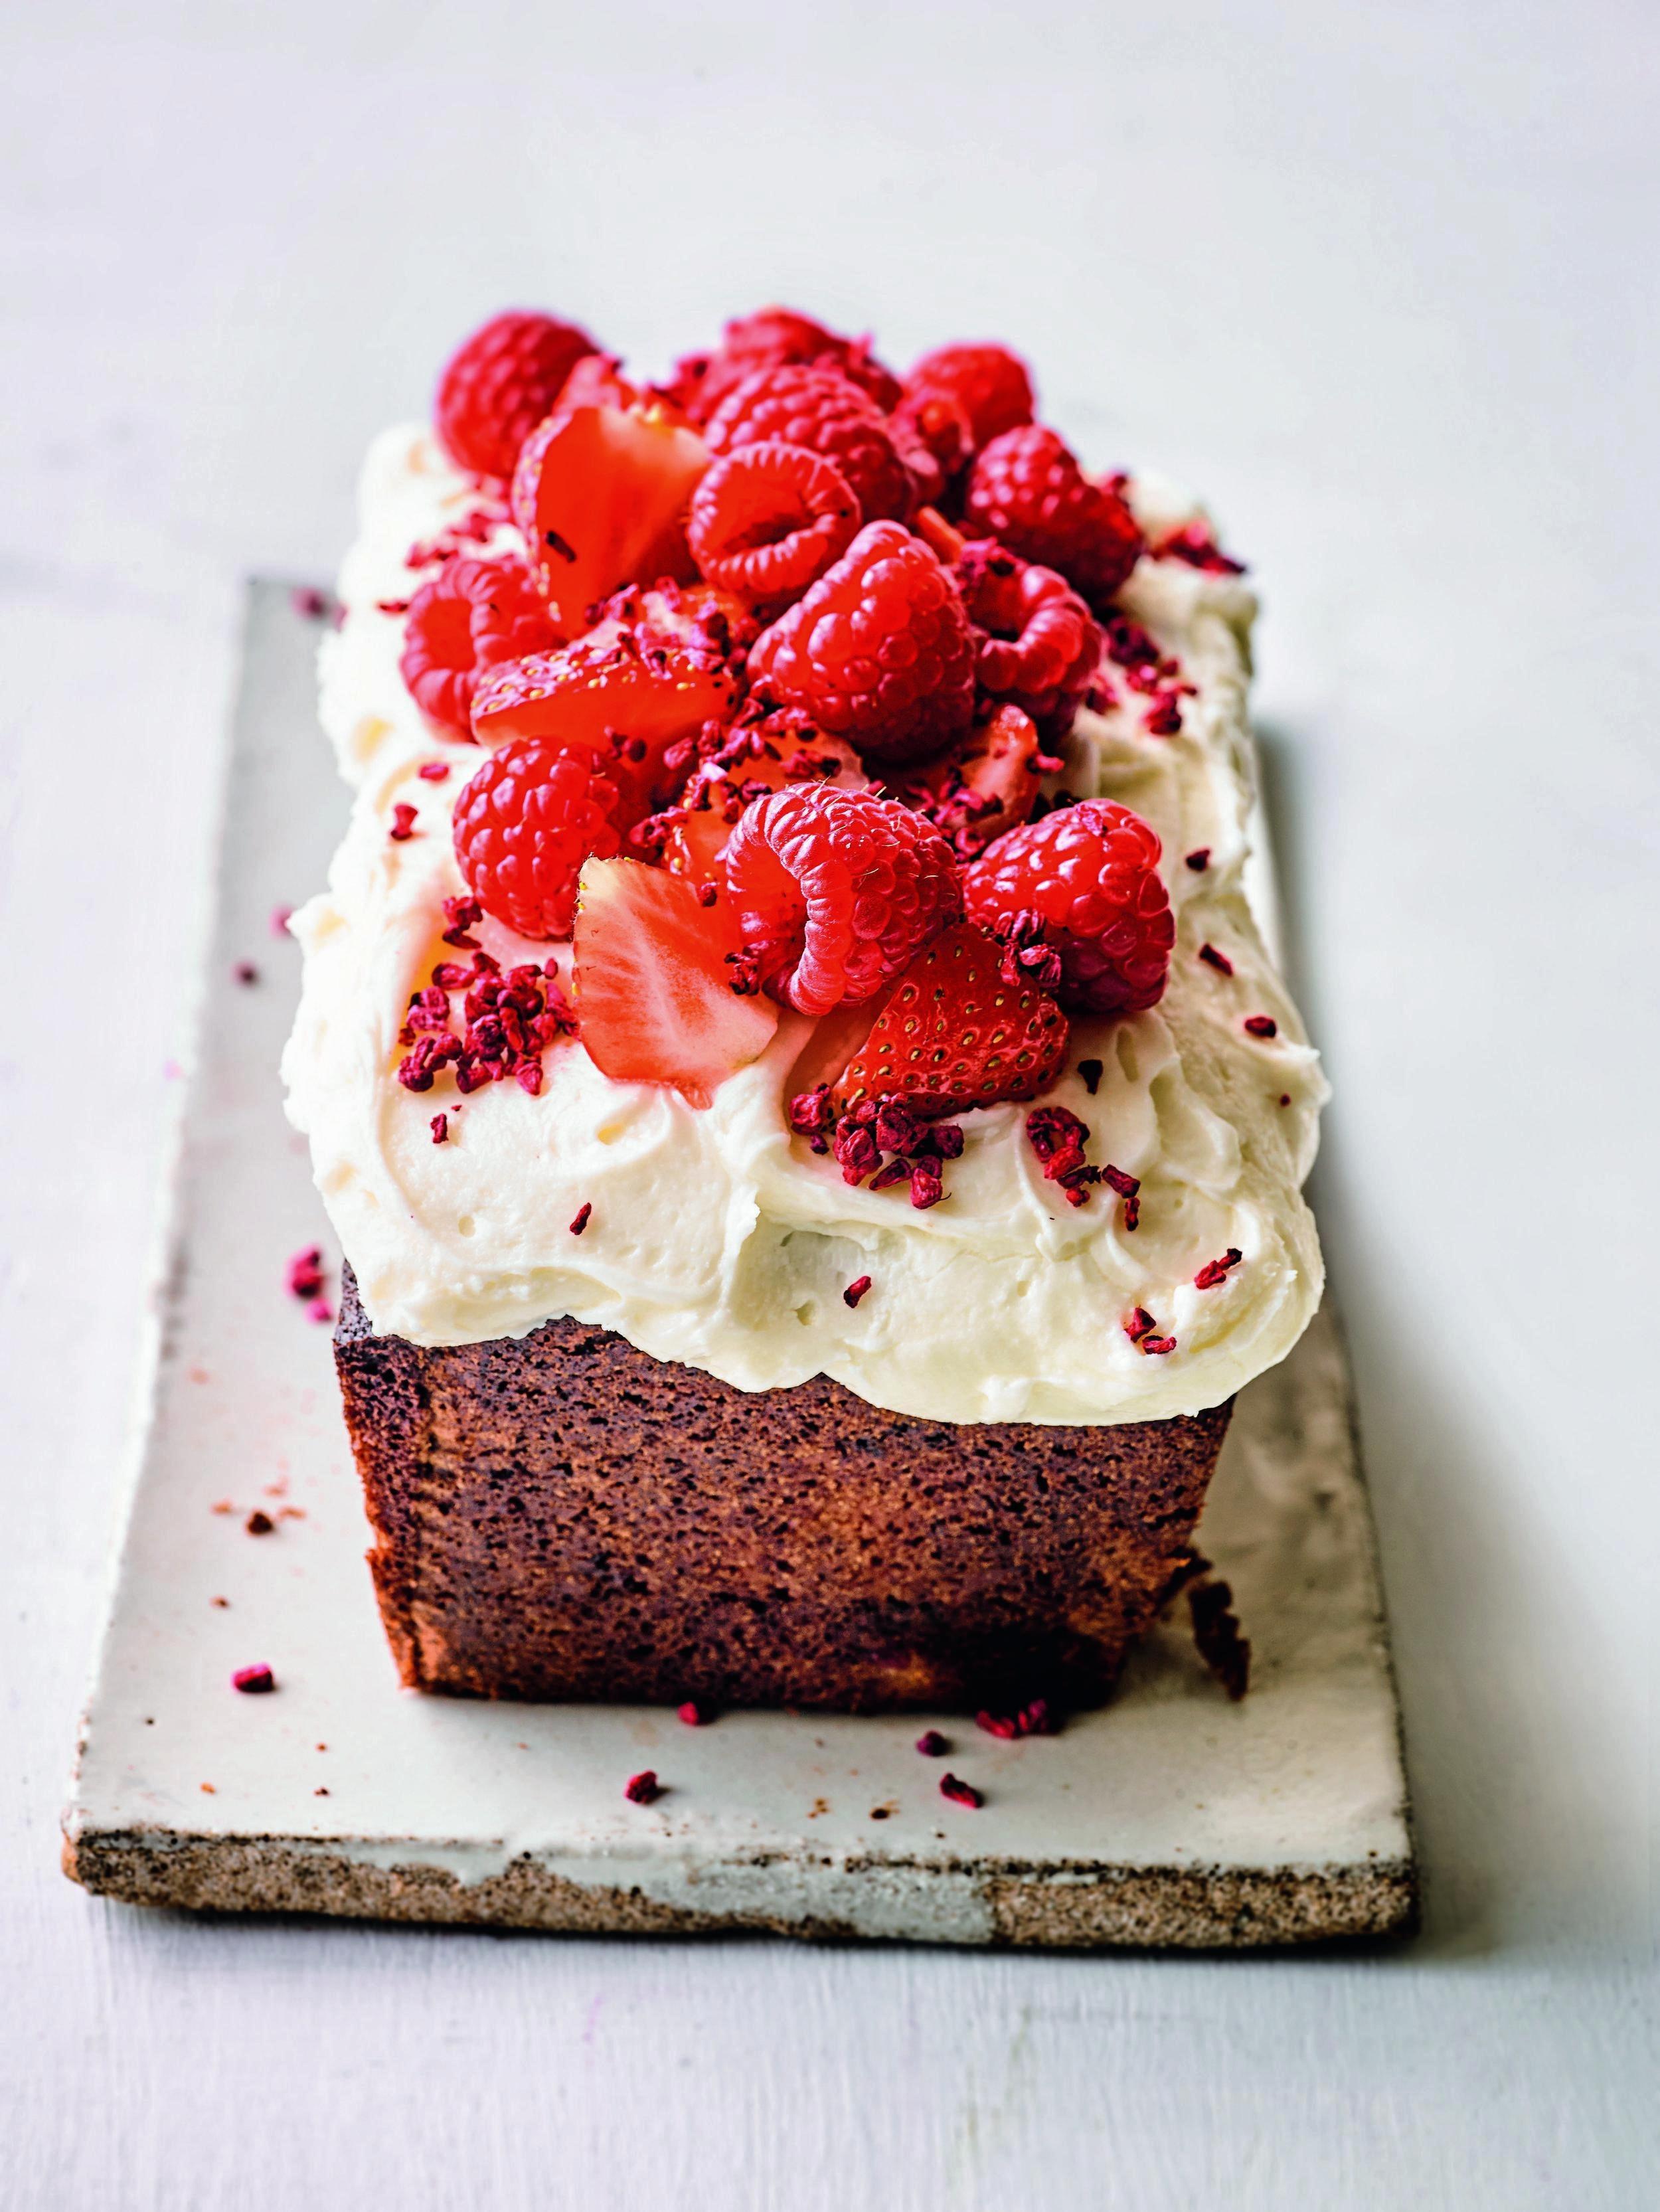 20170614_Waitrose Weekend_SR783_RT_PW_WK362_Martha Bakes_Yoghurt & Berry Loaf Cake_170994.jpg